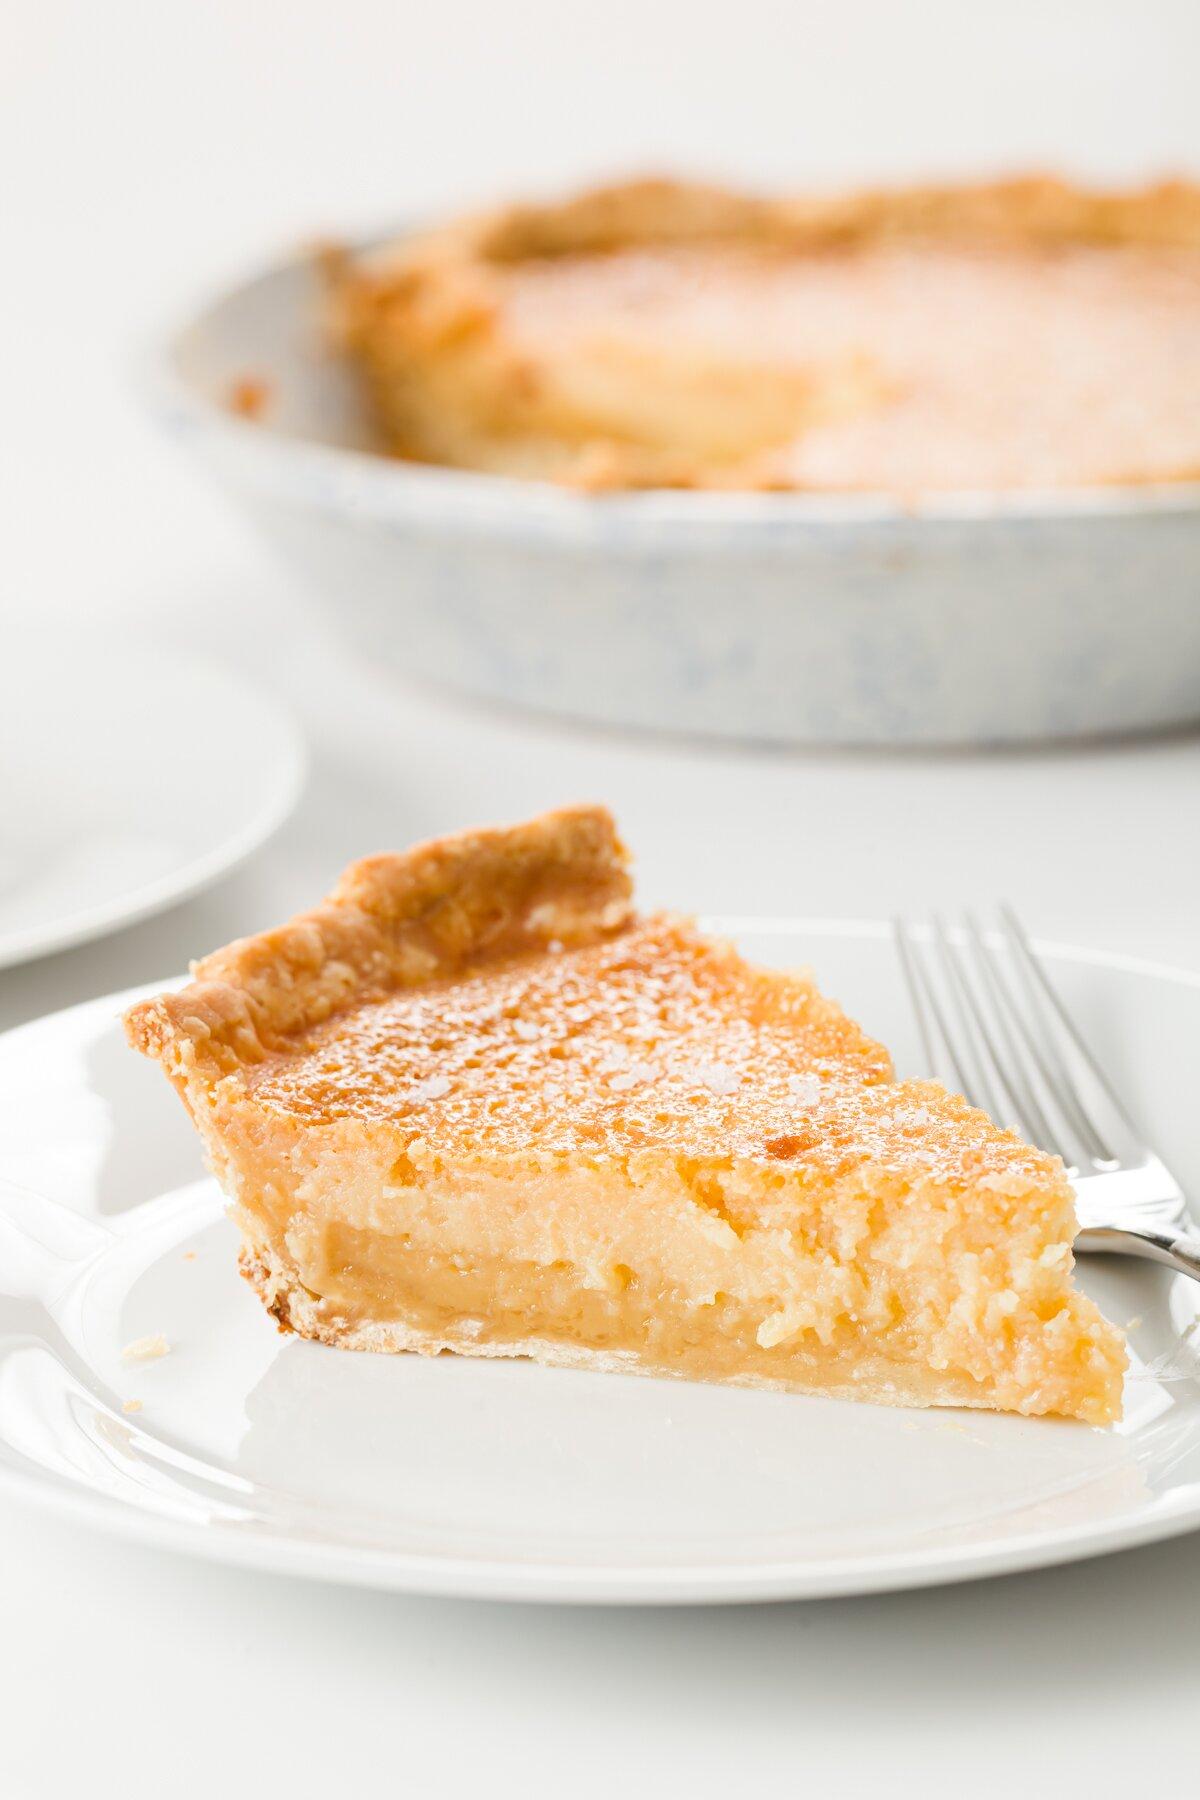 Slice of honey pie on a white plate